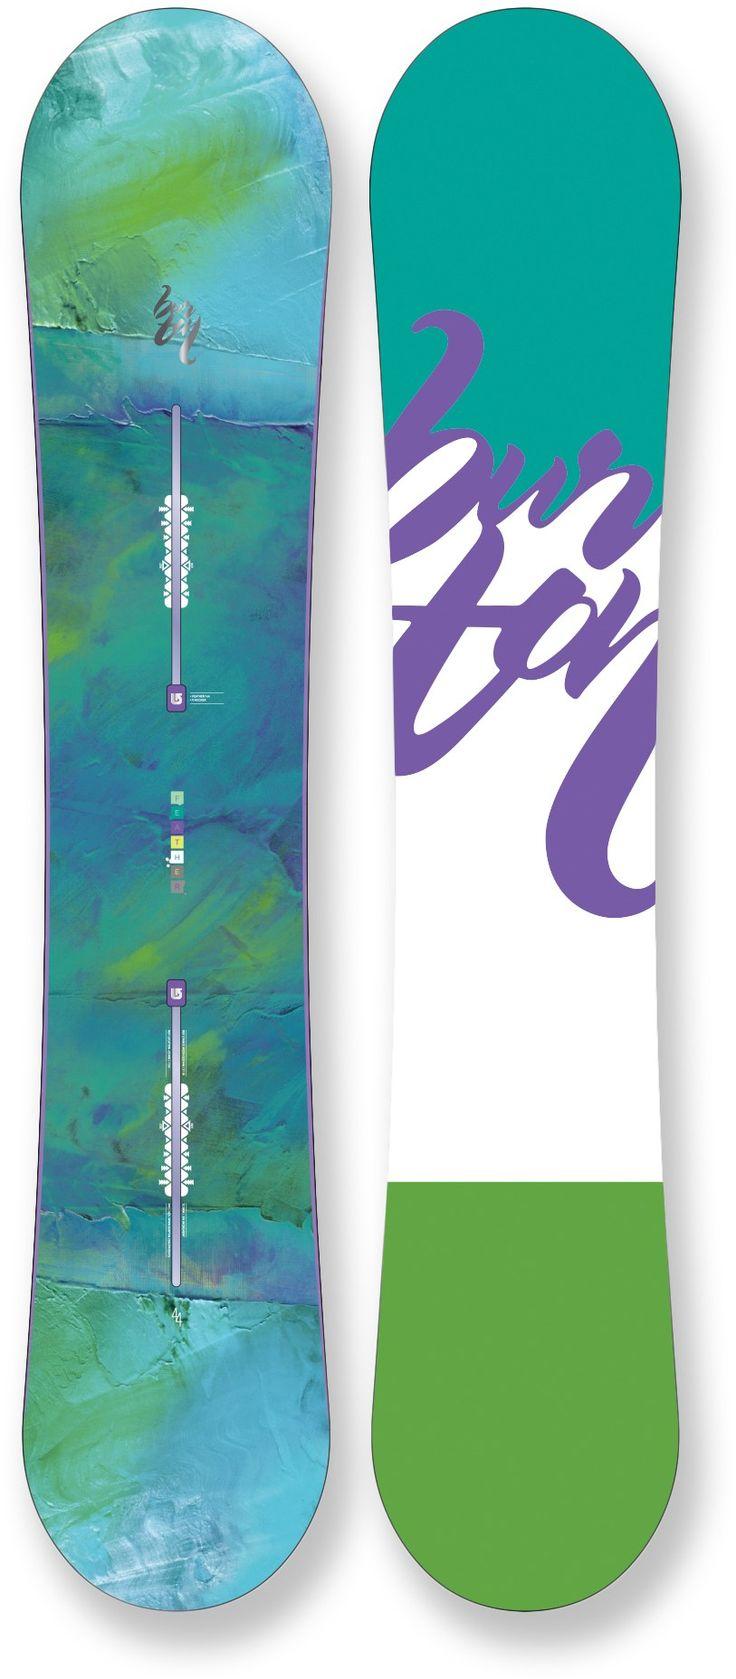 Burton Feather Snowboard - Women's - 2014/2015 - REI.com